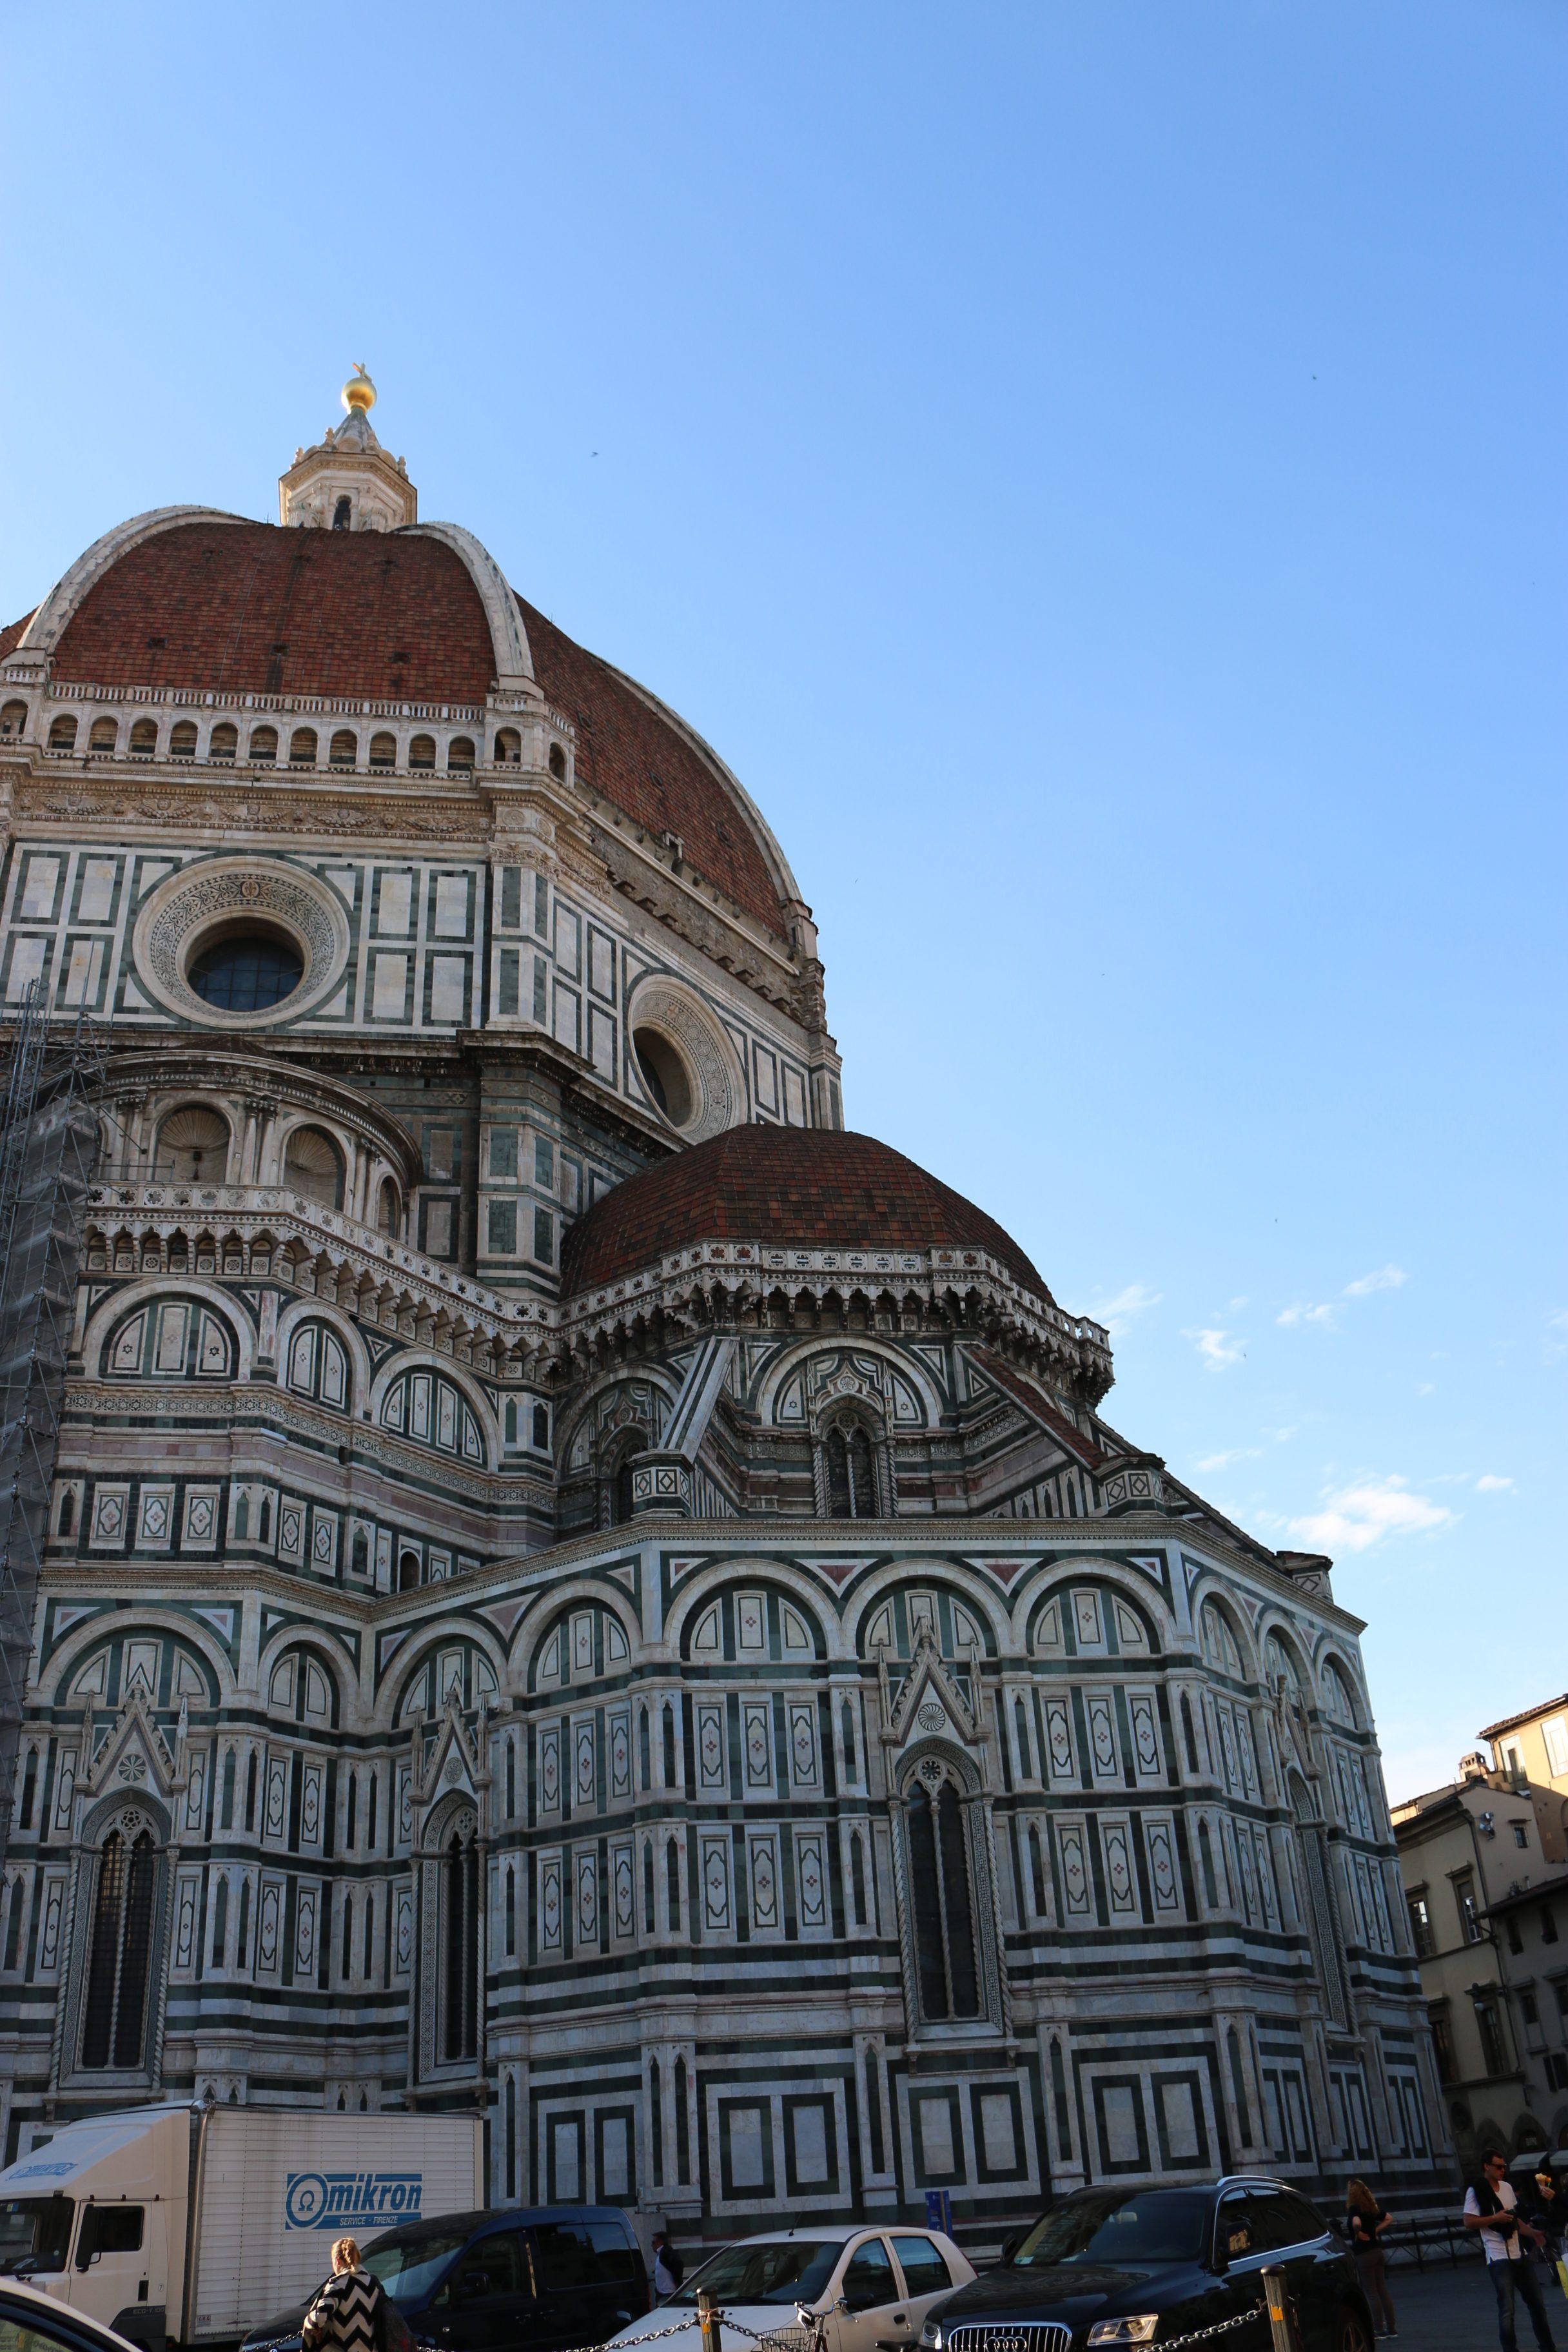 voyage à Florence : piazza del duomo